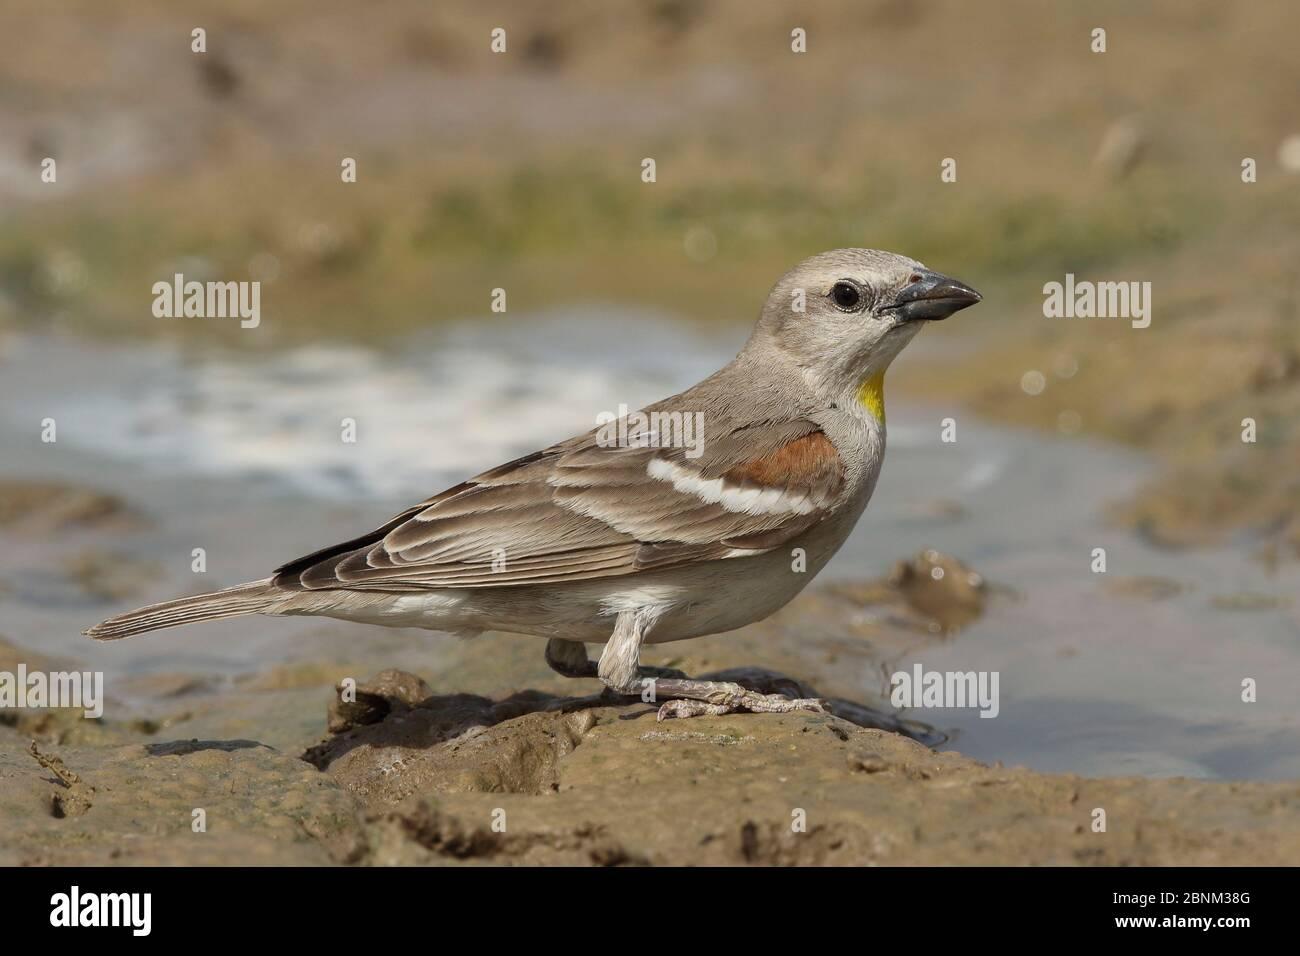 Passero giallo (Gymnoris xantocollis) maschio ad acqua, Oman, aprile Foto Stock